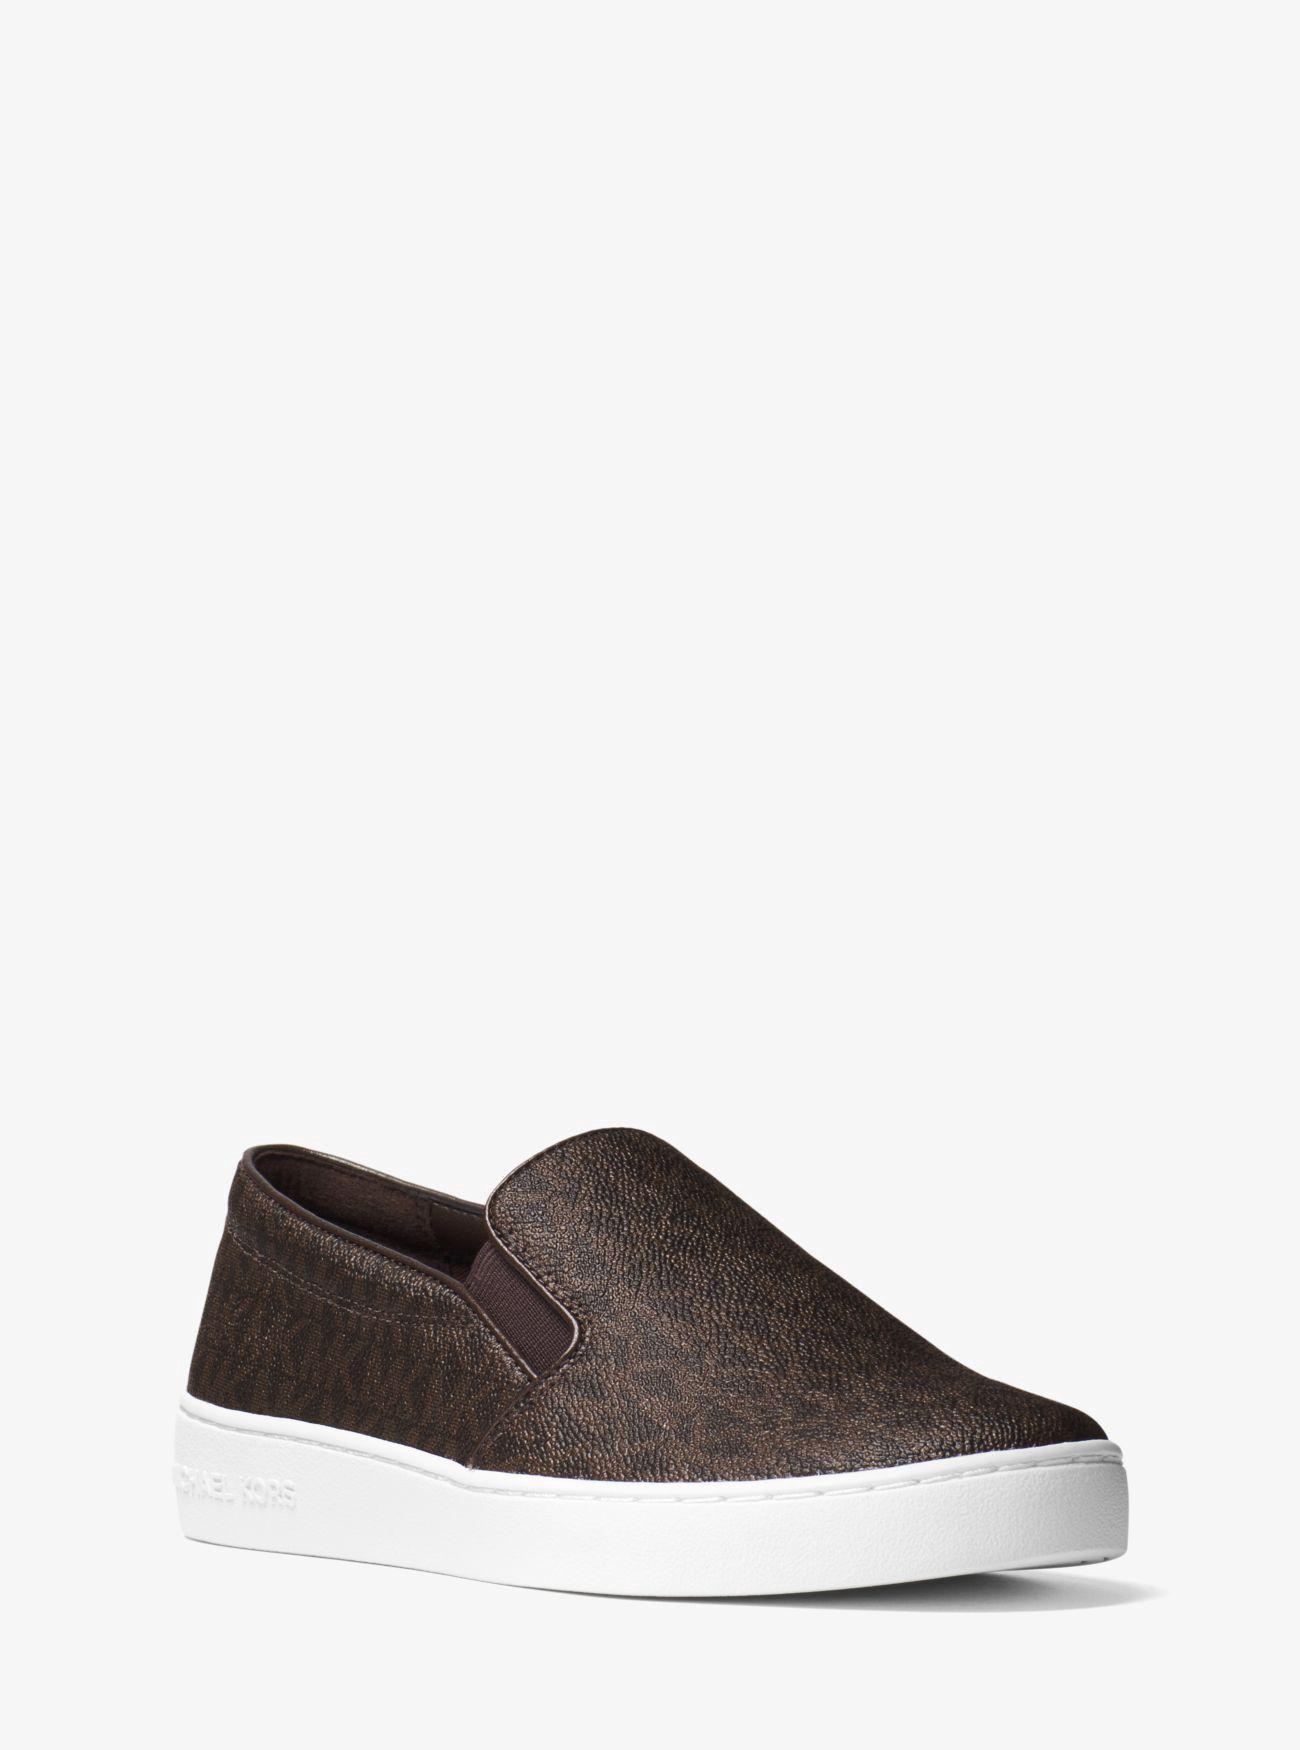 877346412eda5b MICHAEL KORS Keaton Logo Slip-On Sneaker. #michaelkors #shoes ...